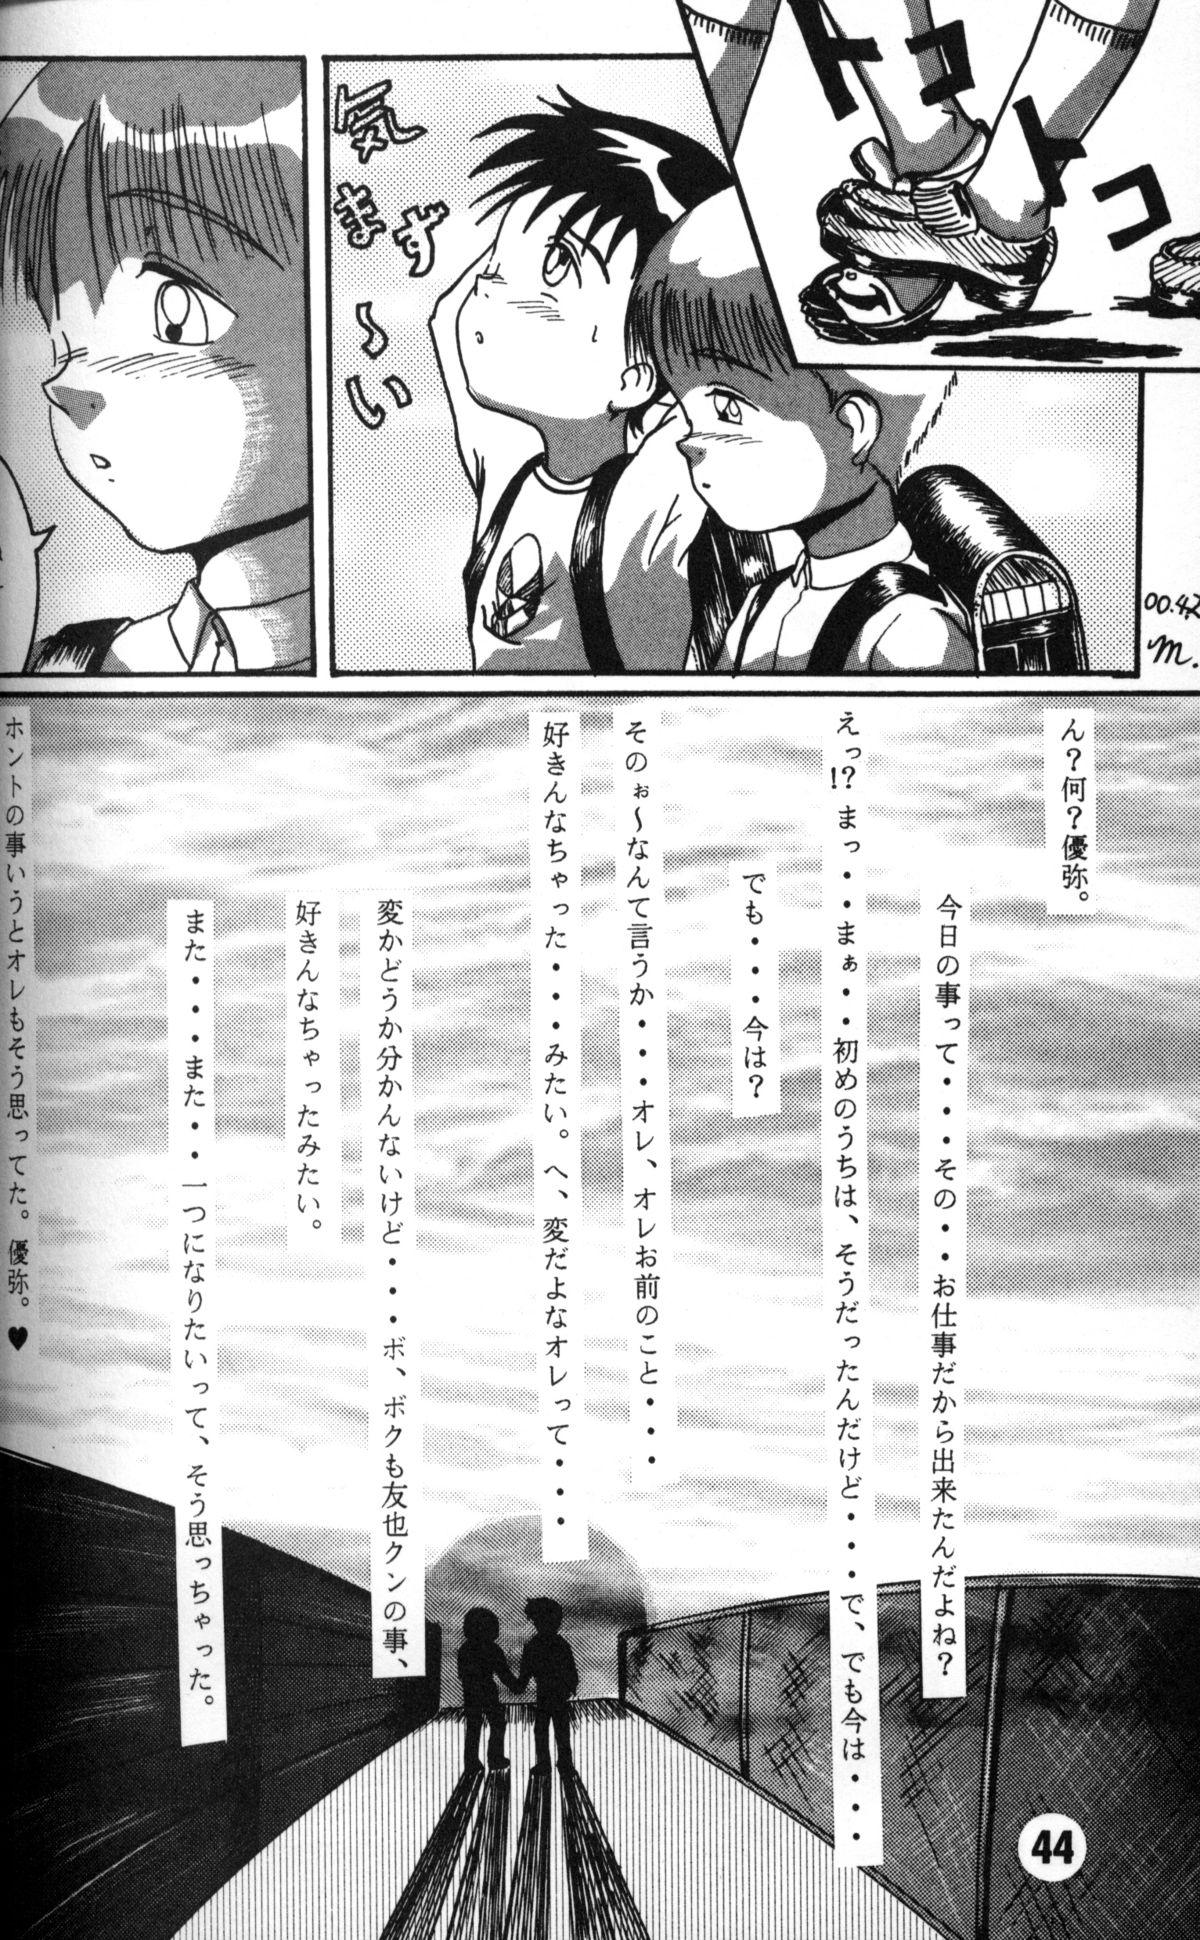 Anthology - Nekketsu Project - Volume 4 'Shounen Vanilla Essence' 42